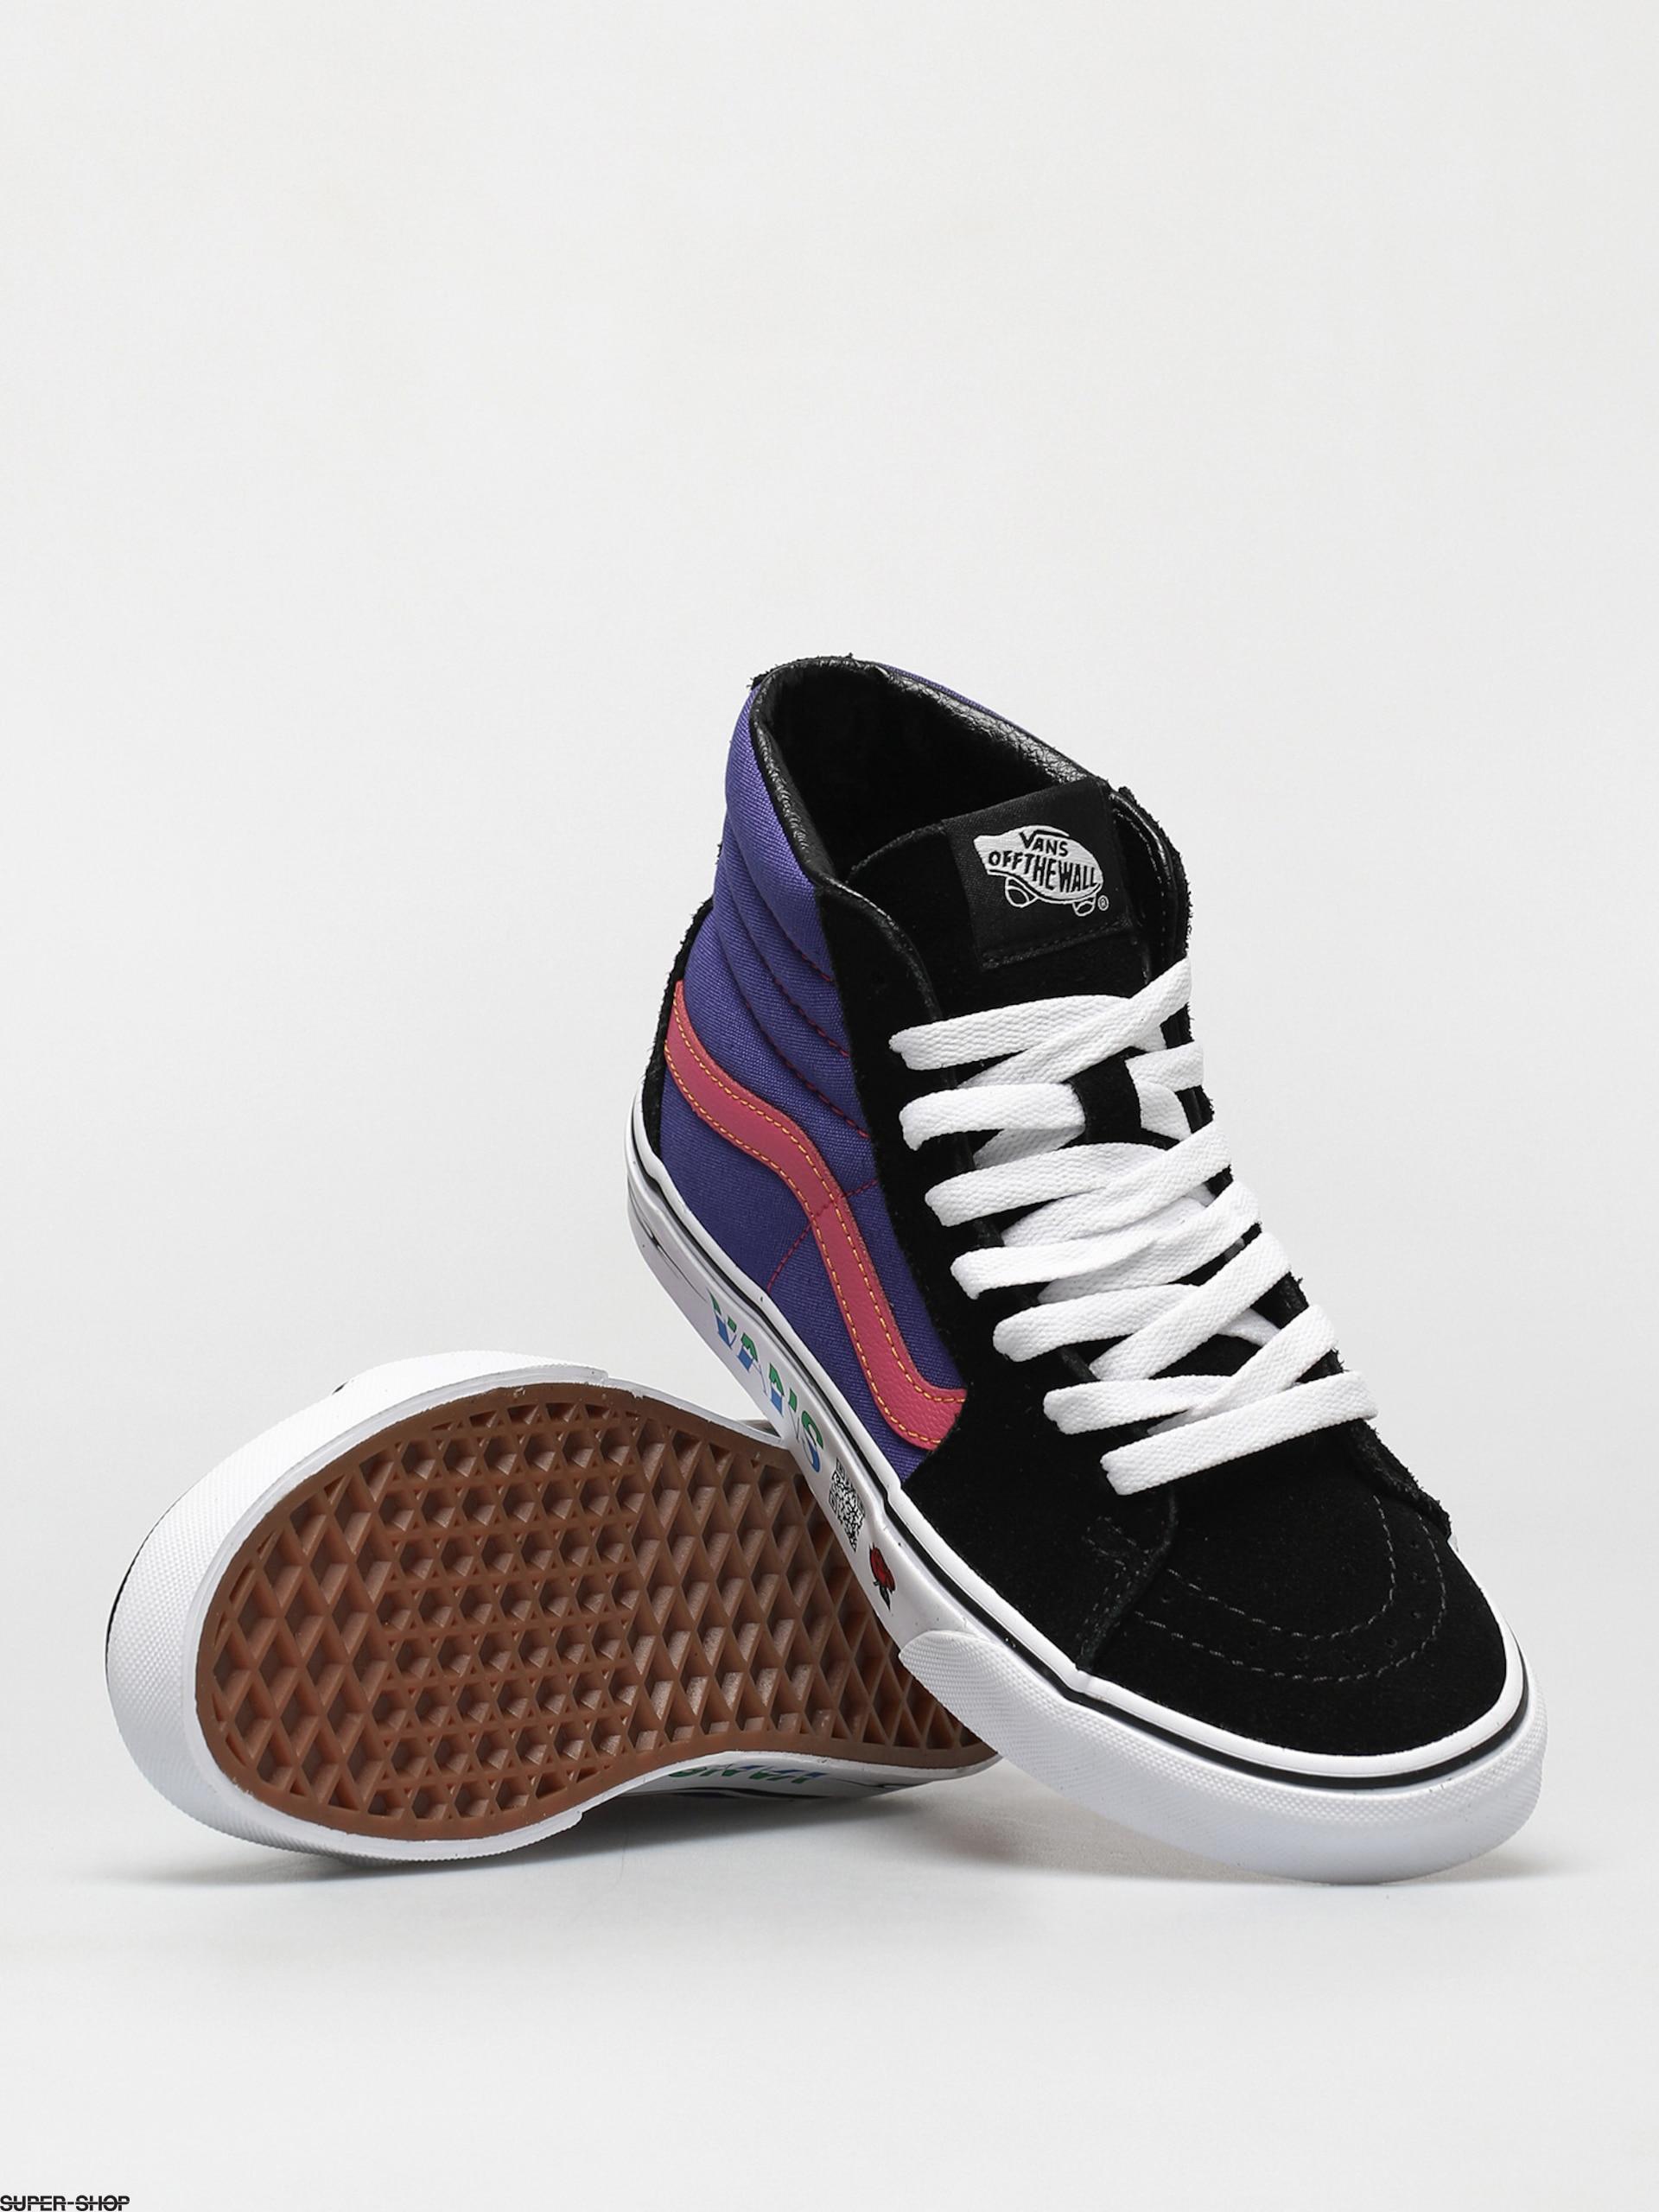 Vans Sk8 Hi Shoes (disruptive black/spectrum blue)